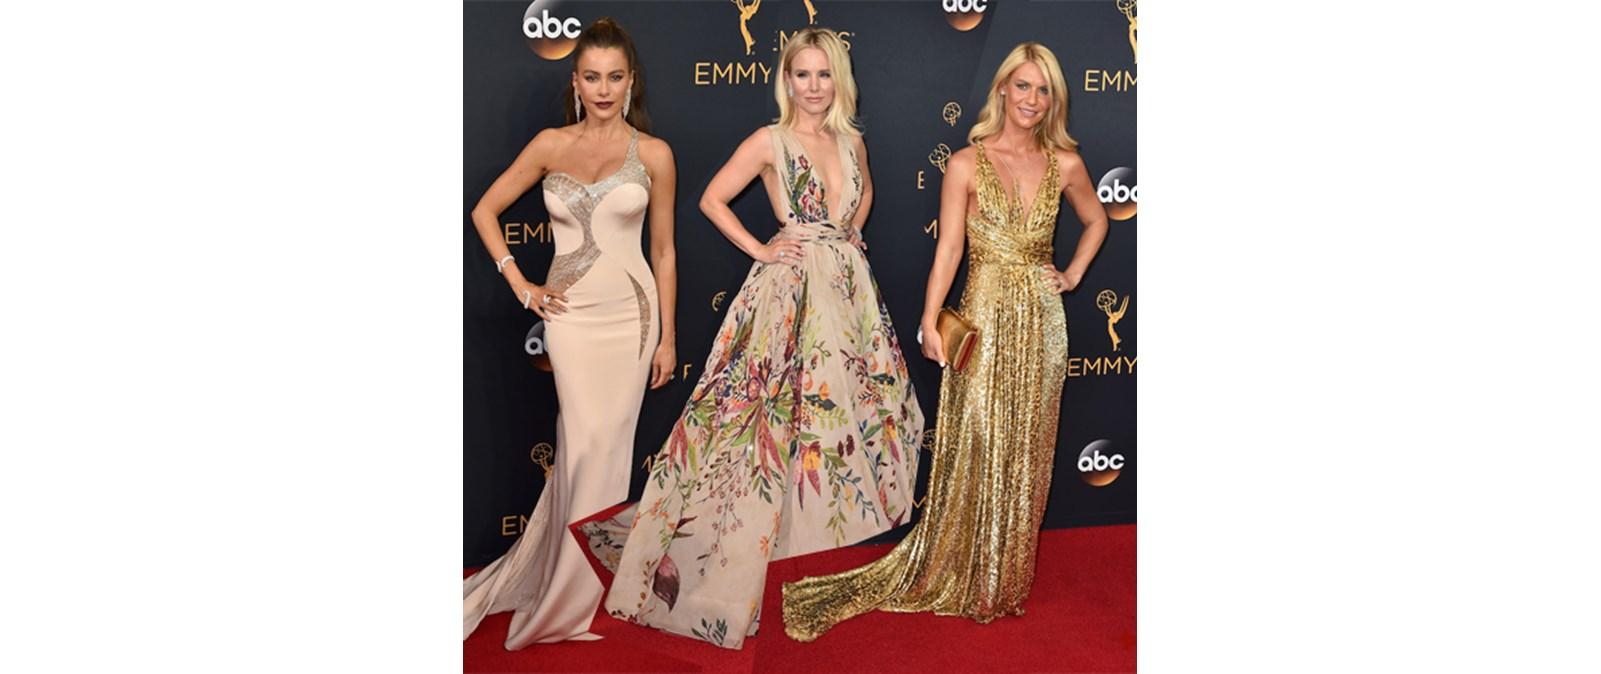 Emmy Awards 2016  Όλοι οι celebrities στο κόκκινο χαλί a0e32de366a